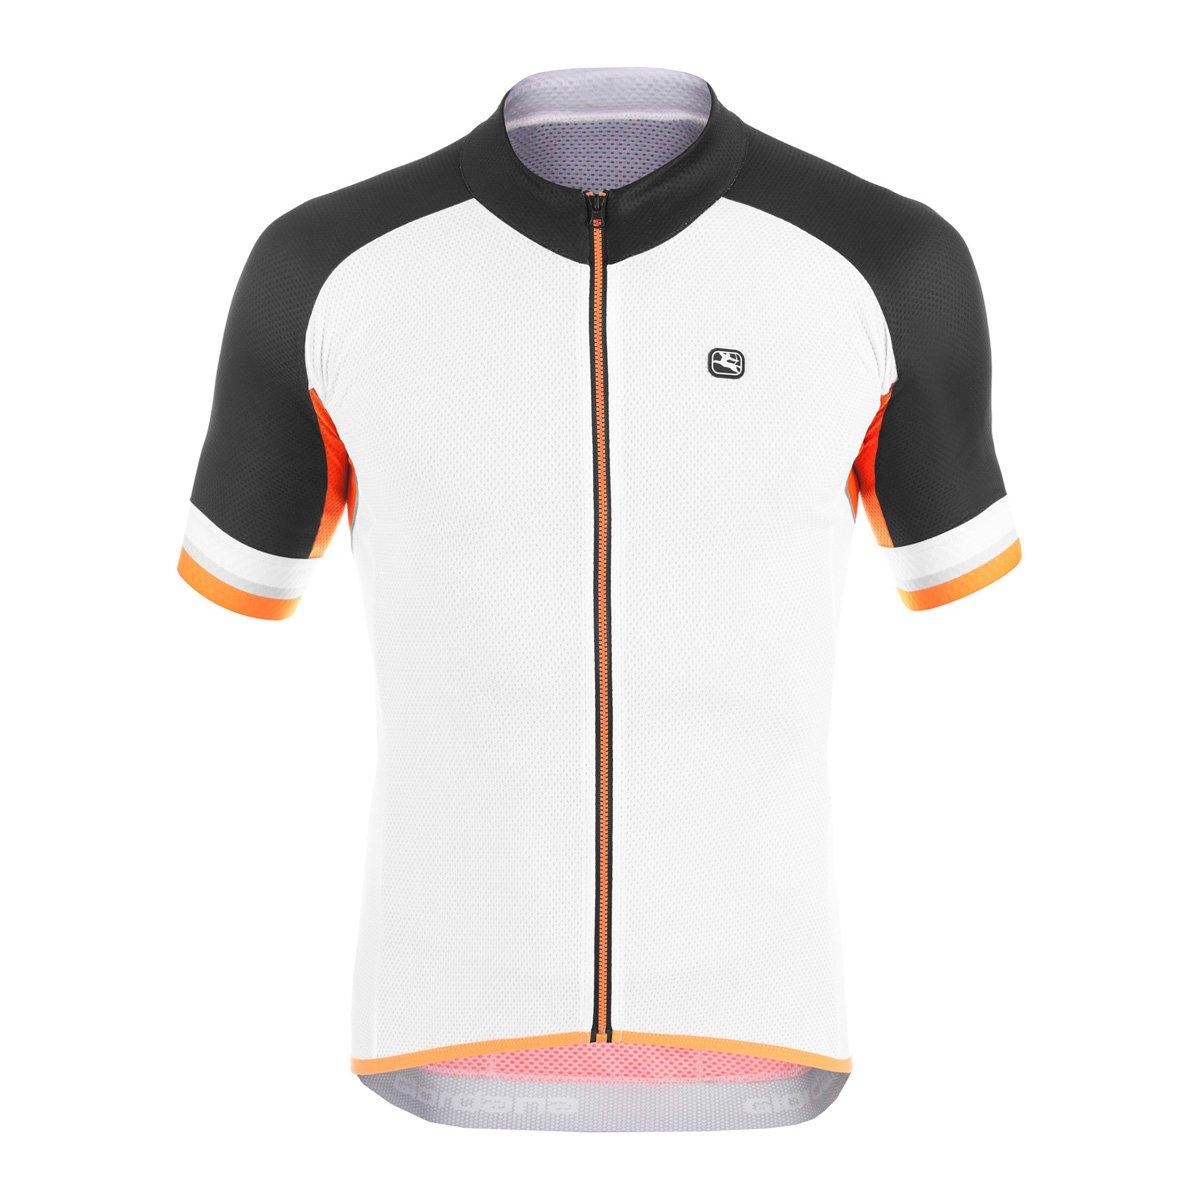 Giordana 2016メンズSilverline半袖サイクリングジャージー – gi-s6-ssjy-silv B01BN2G9RQ X-Large|White/Black/Orange White/Black/Orange X-Large